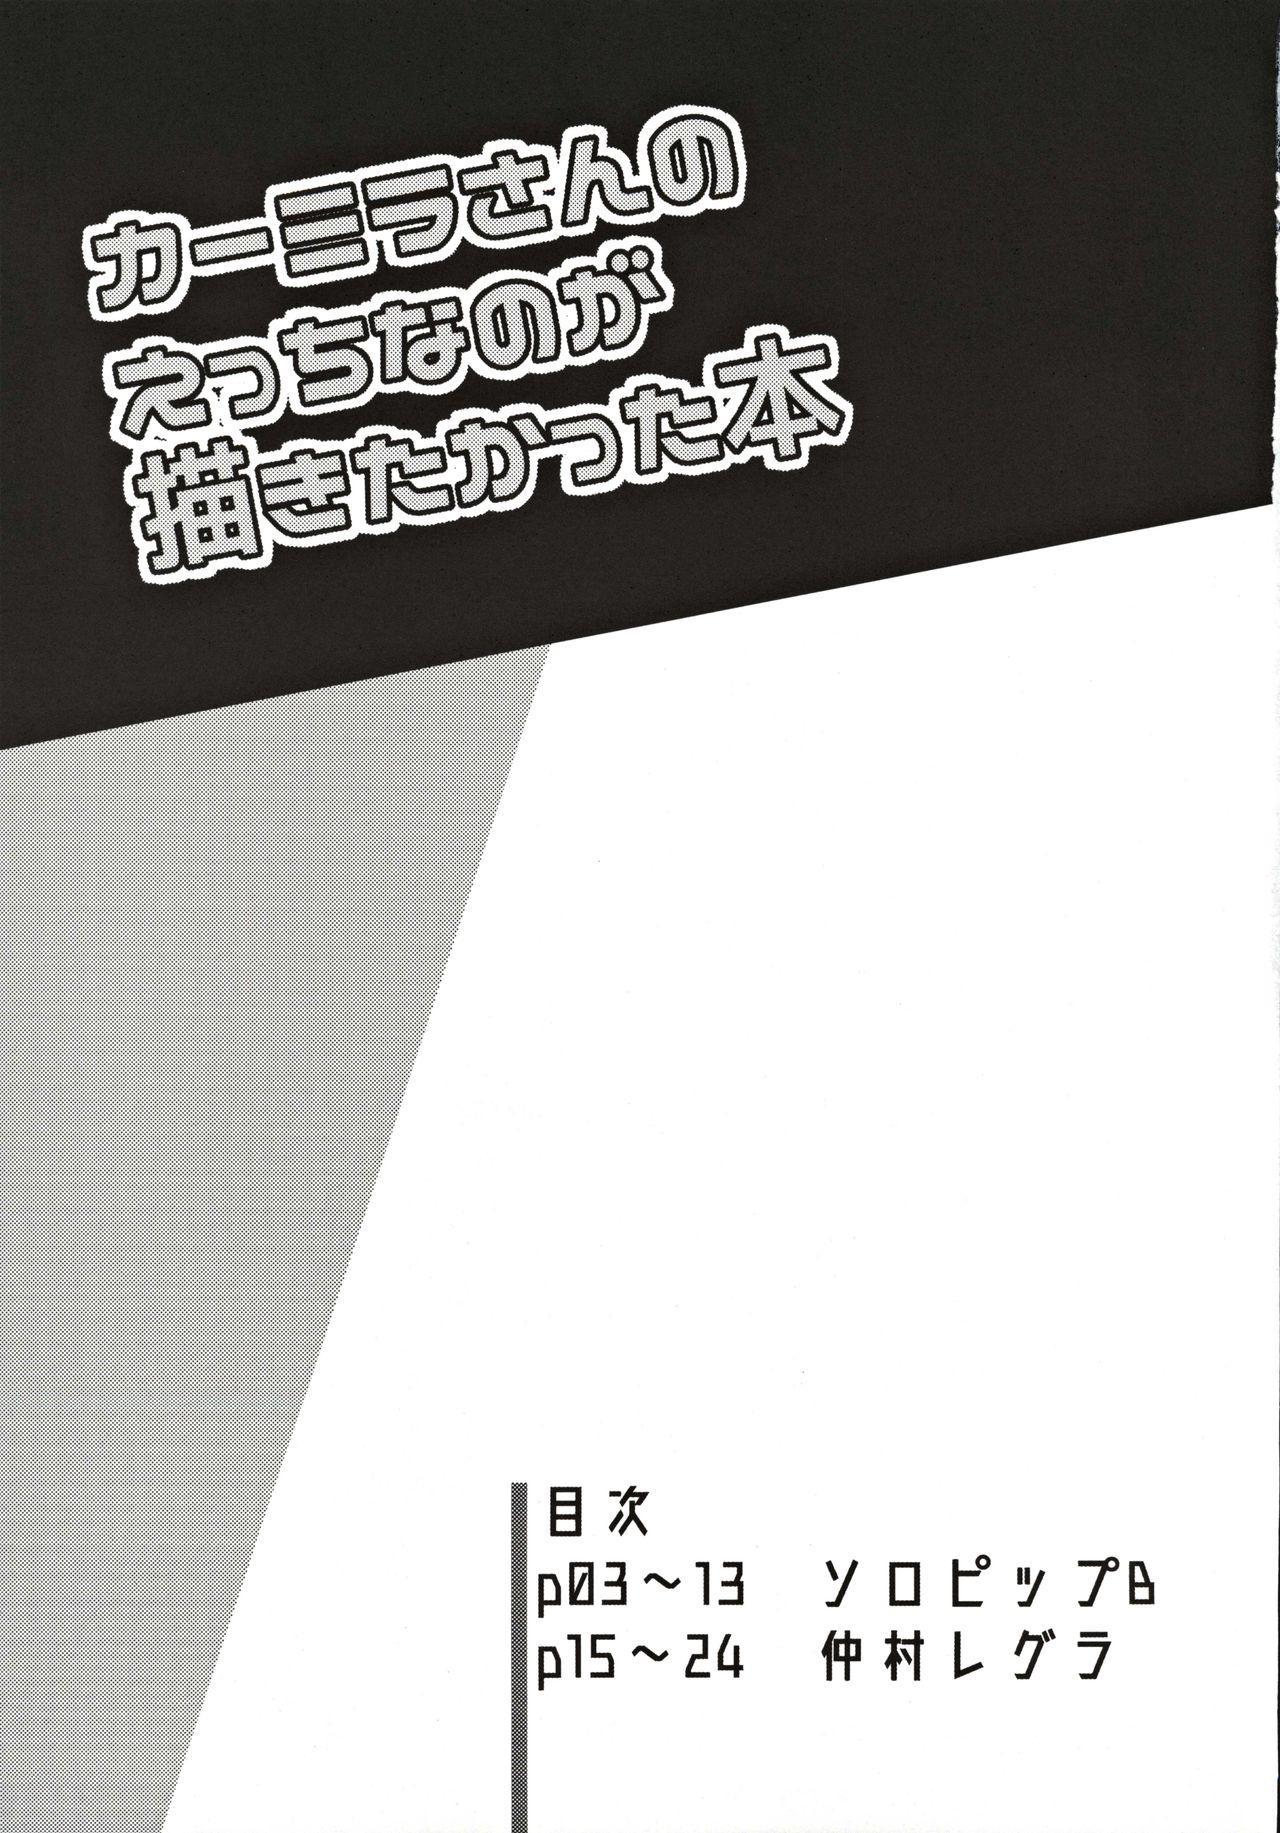 Carmilla-san no Ecchi na no ga Kakitakatta Hon 1